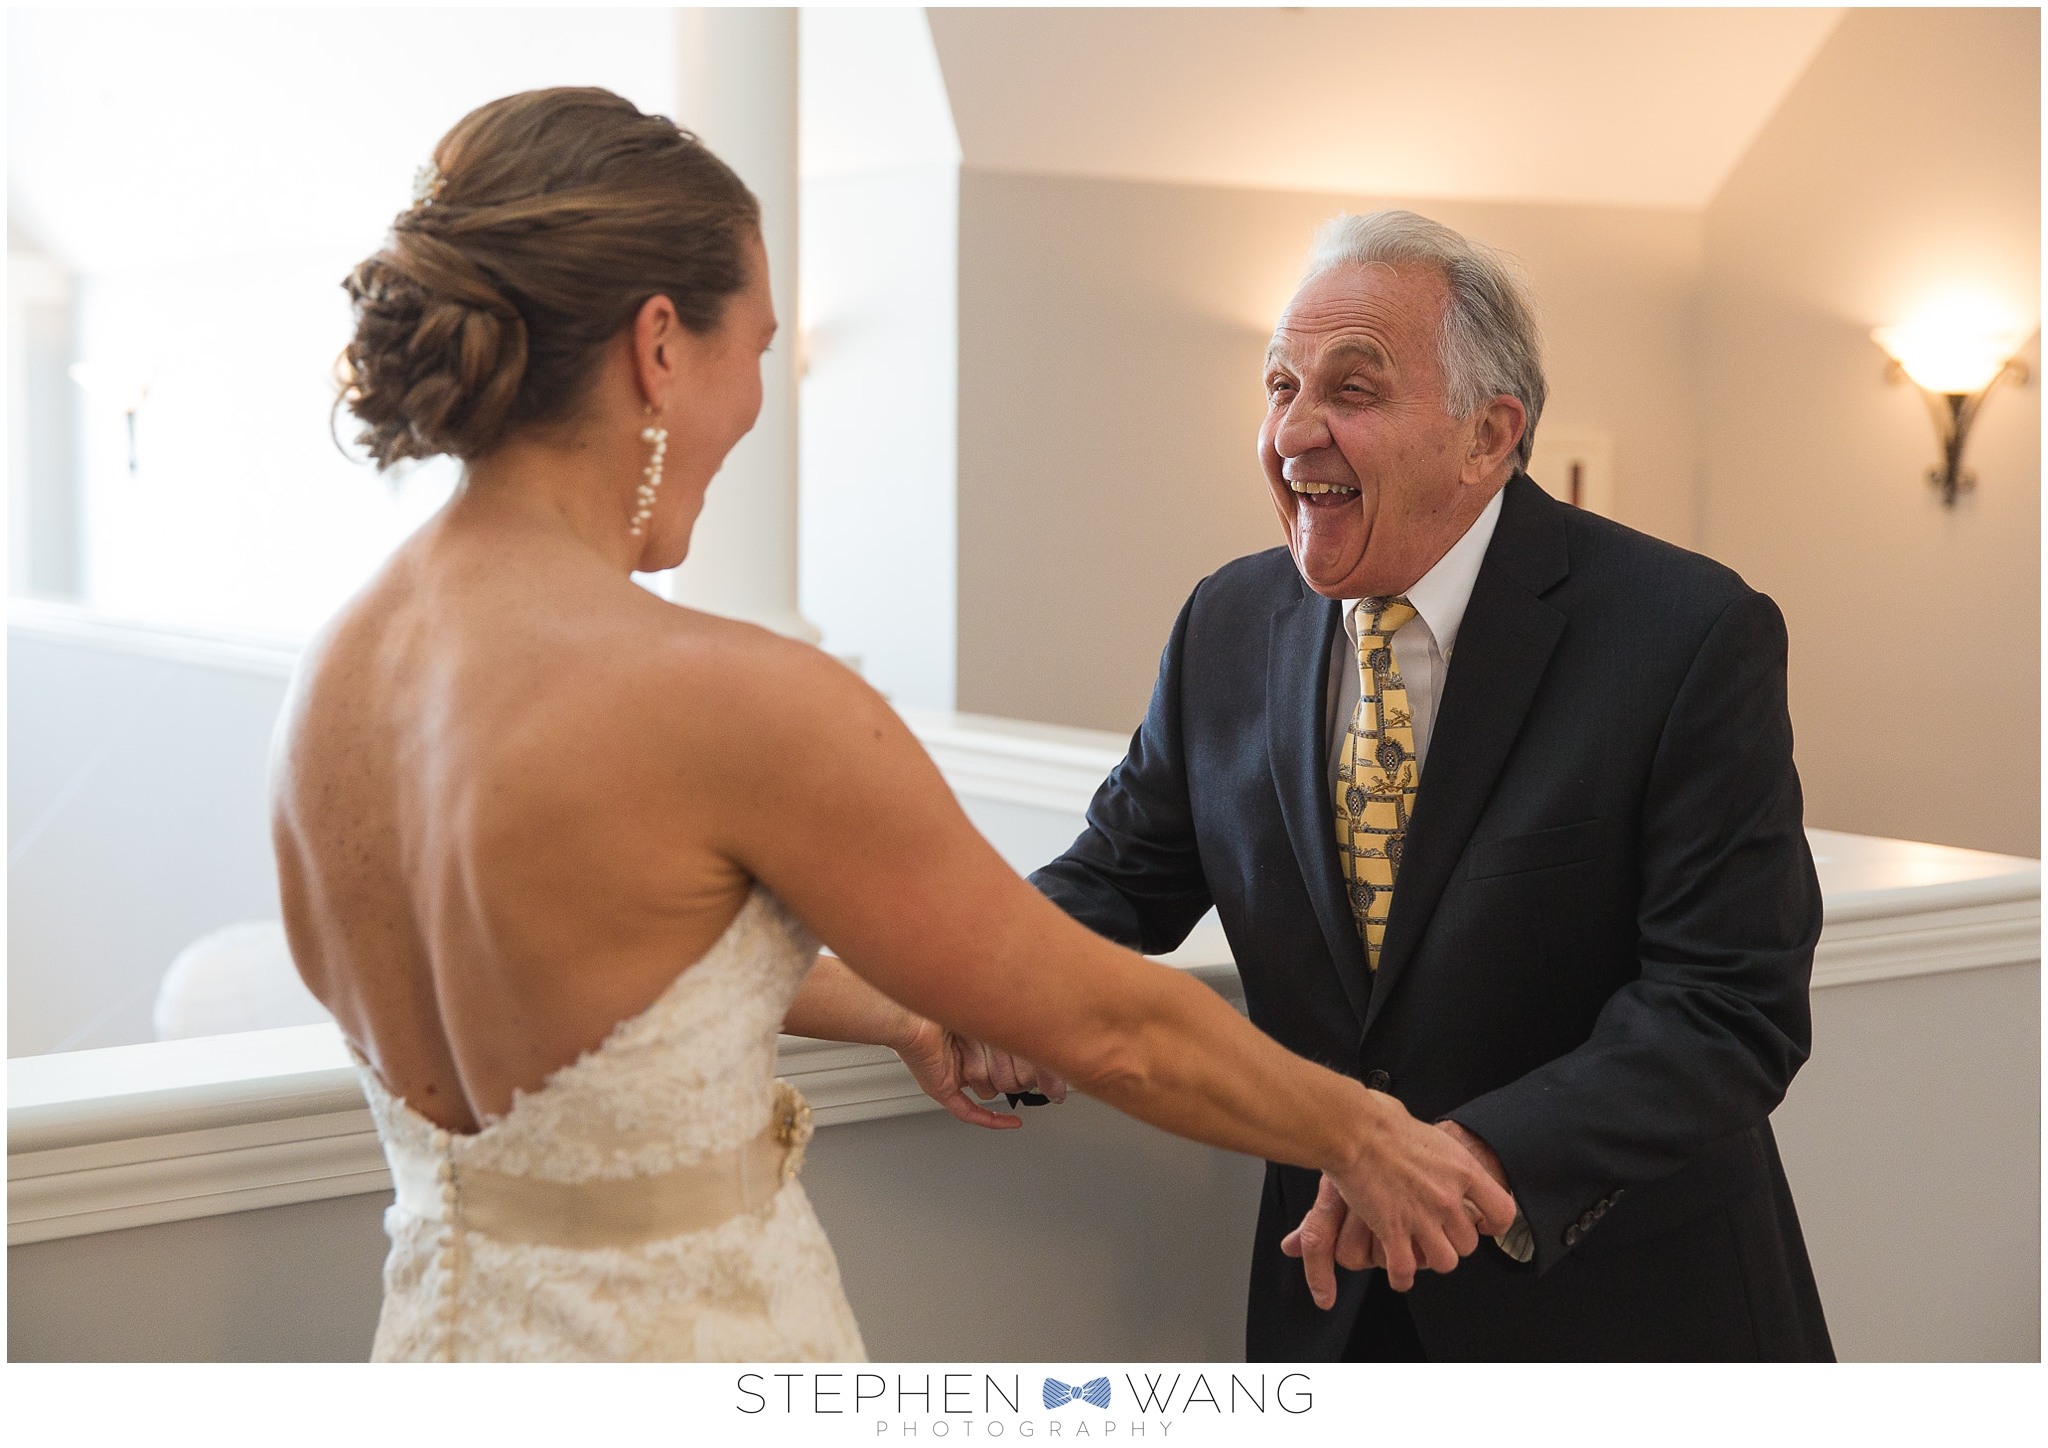 Stephen Wang Photography Wedding Photographer Connecticut CT-12-24_0027.jpg